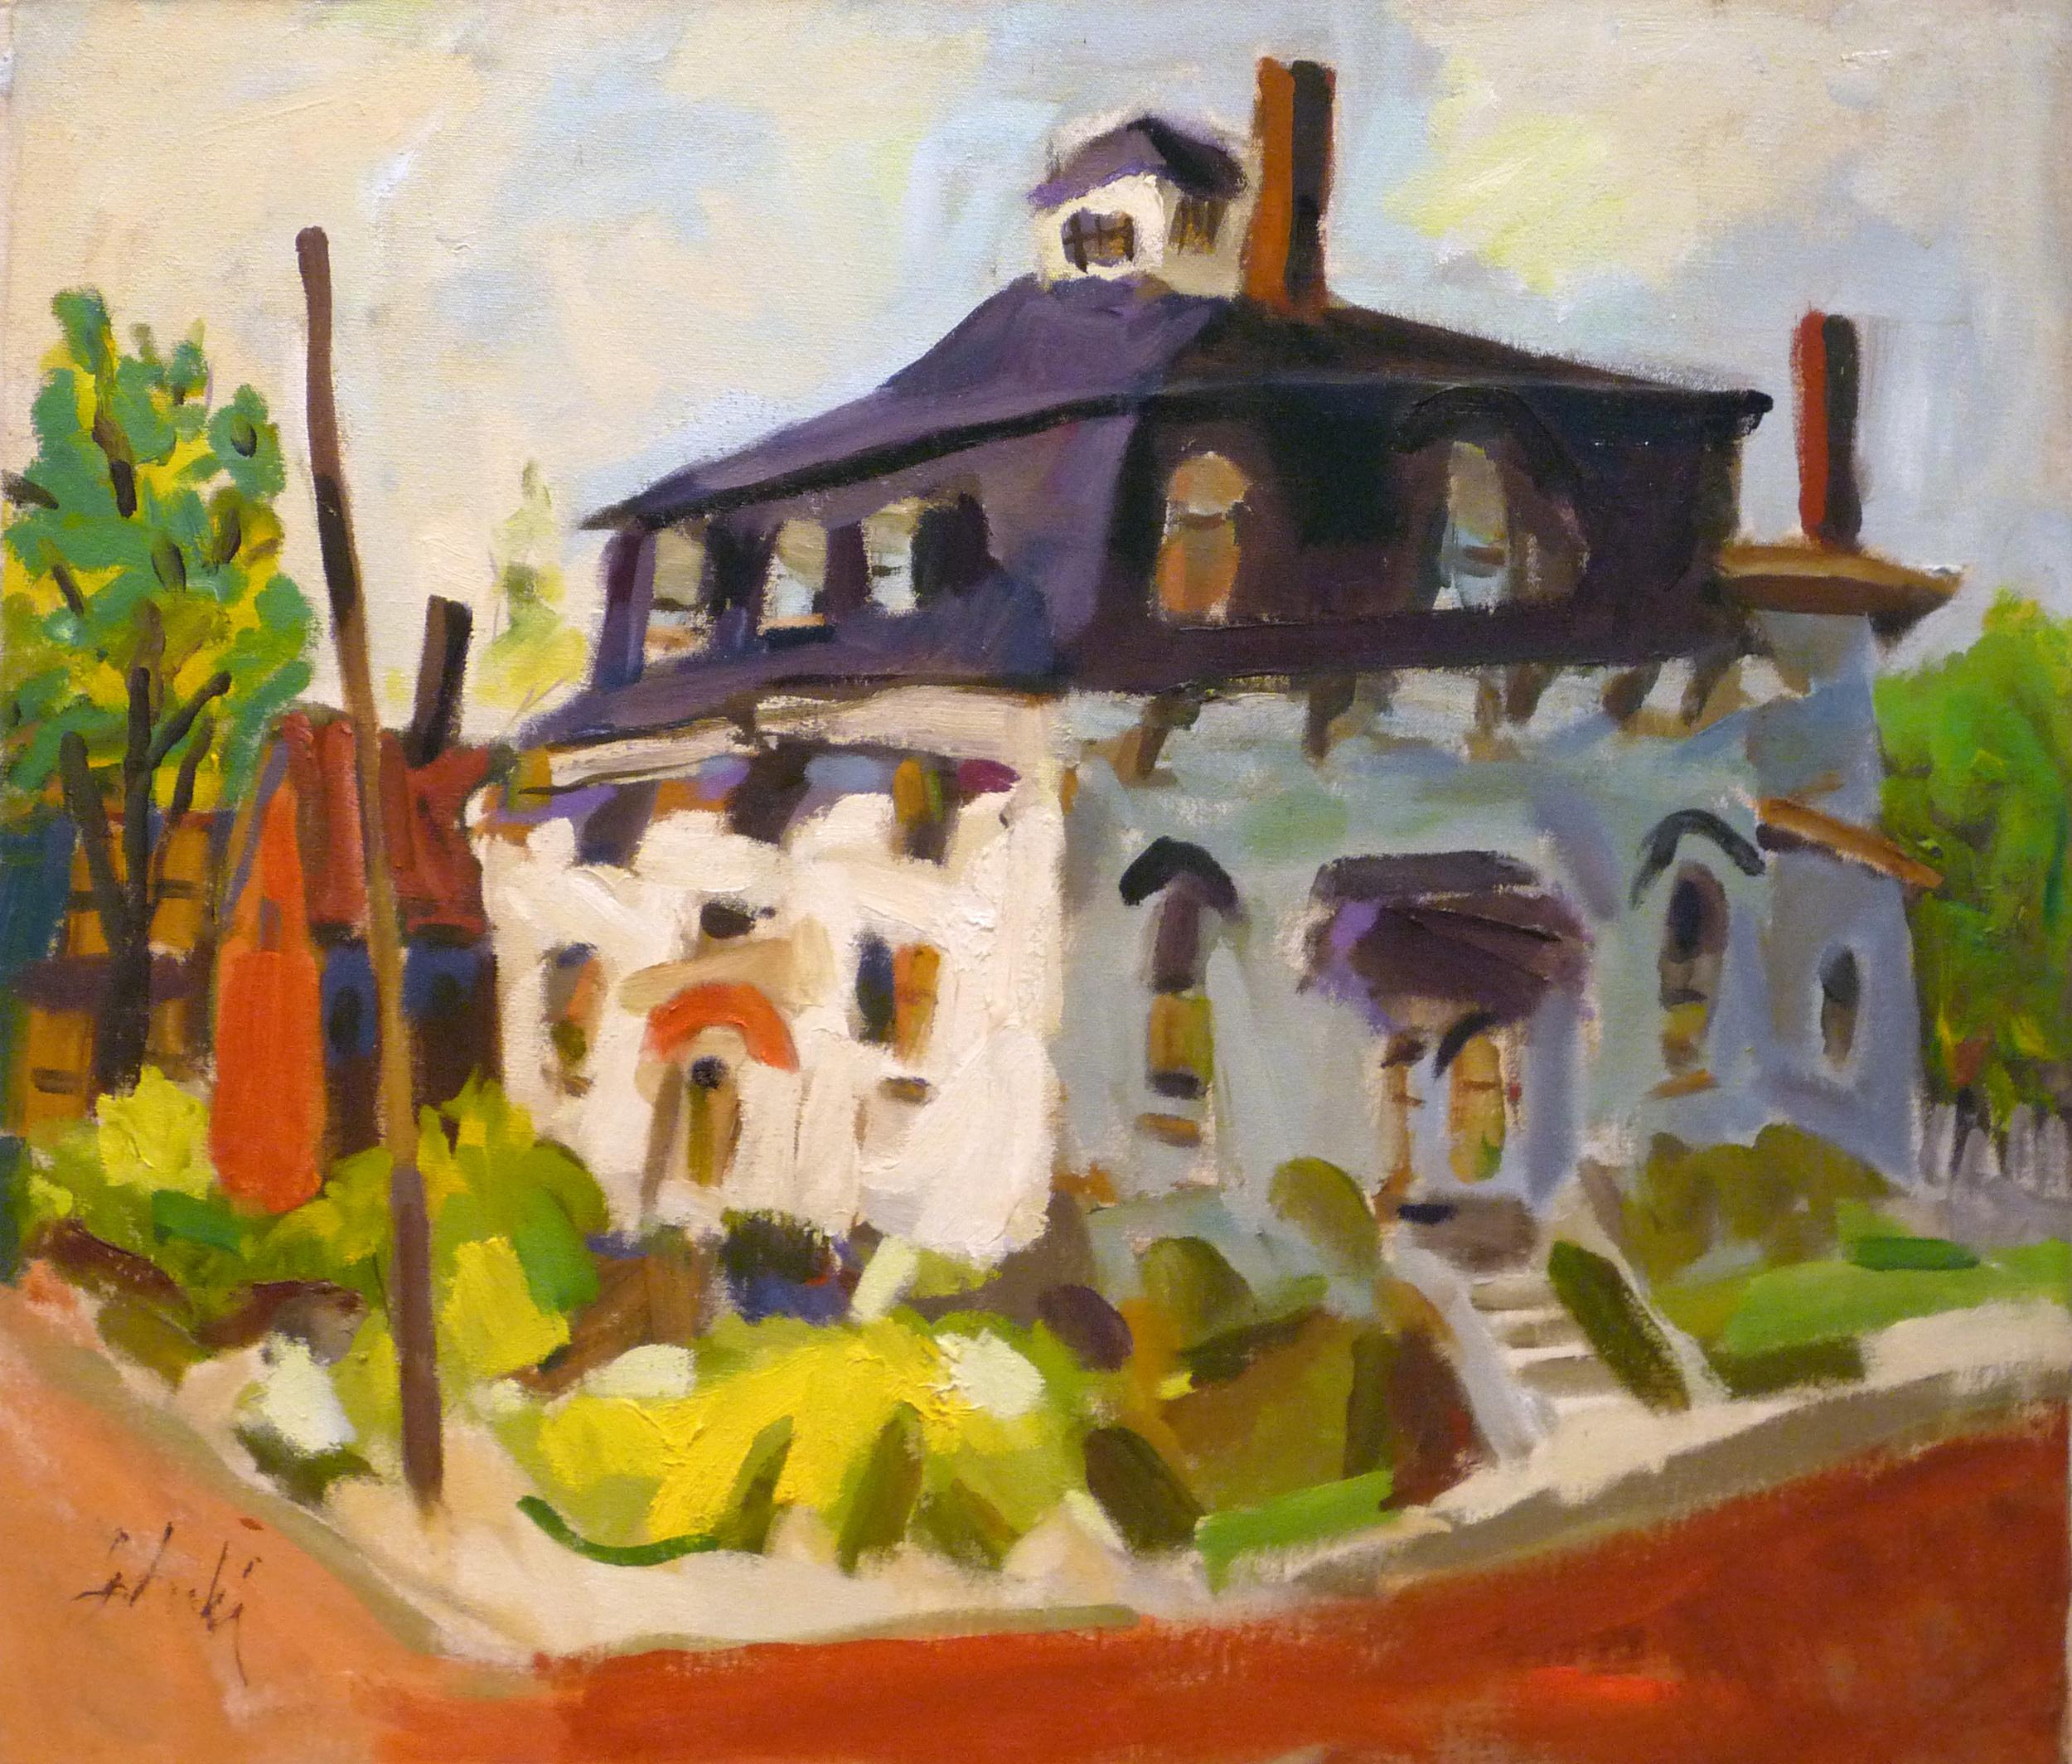 Zygmund Jankowski-House on the Corner-oil on canvas-24x28.jpg